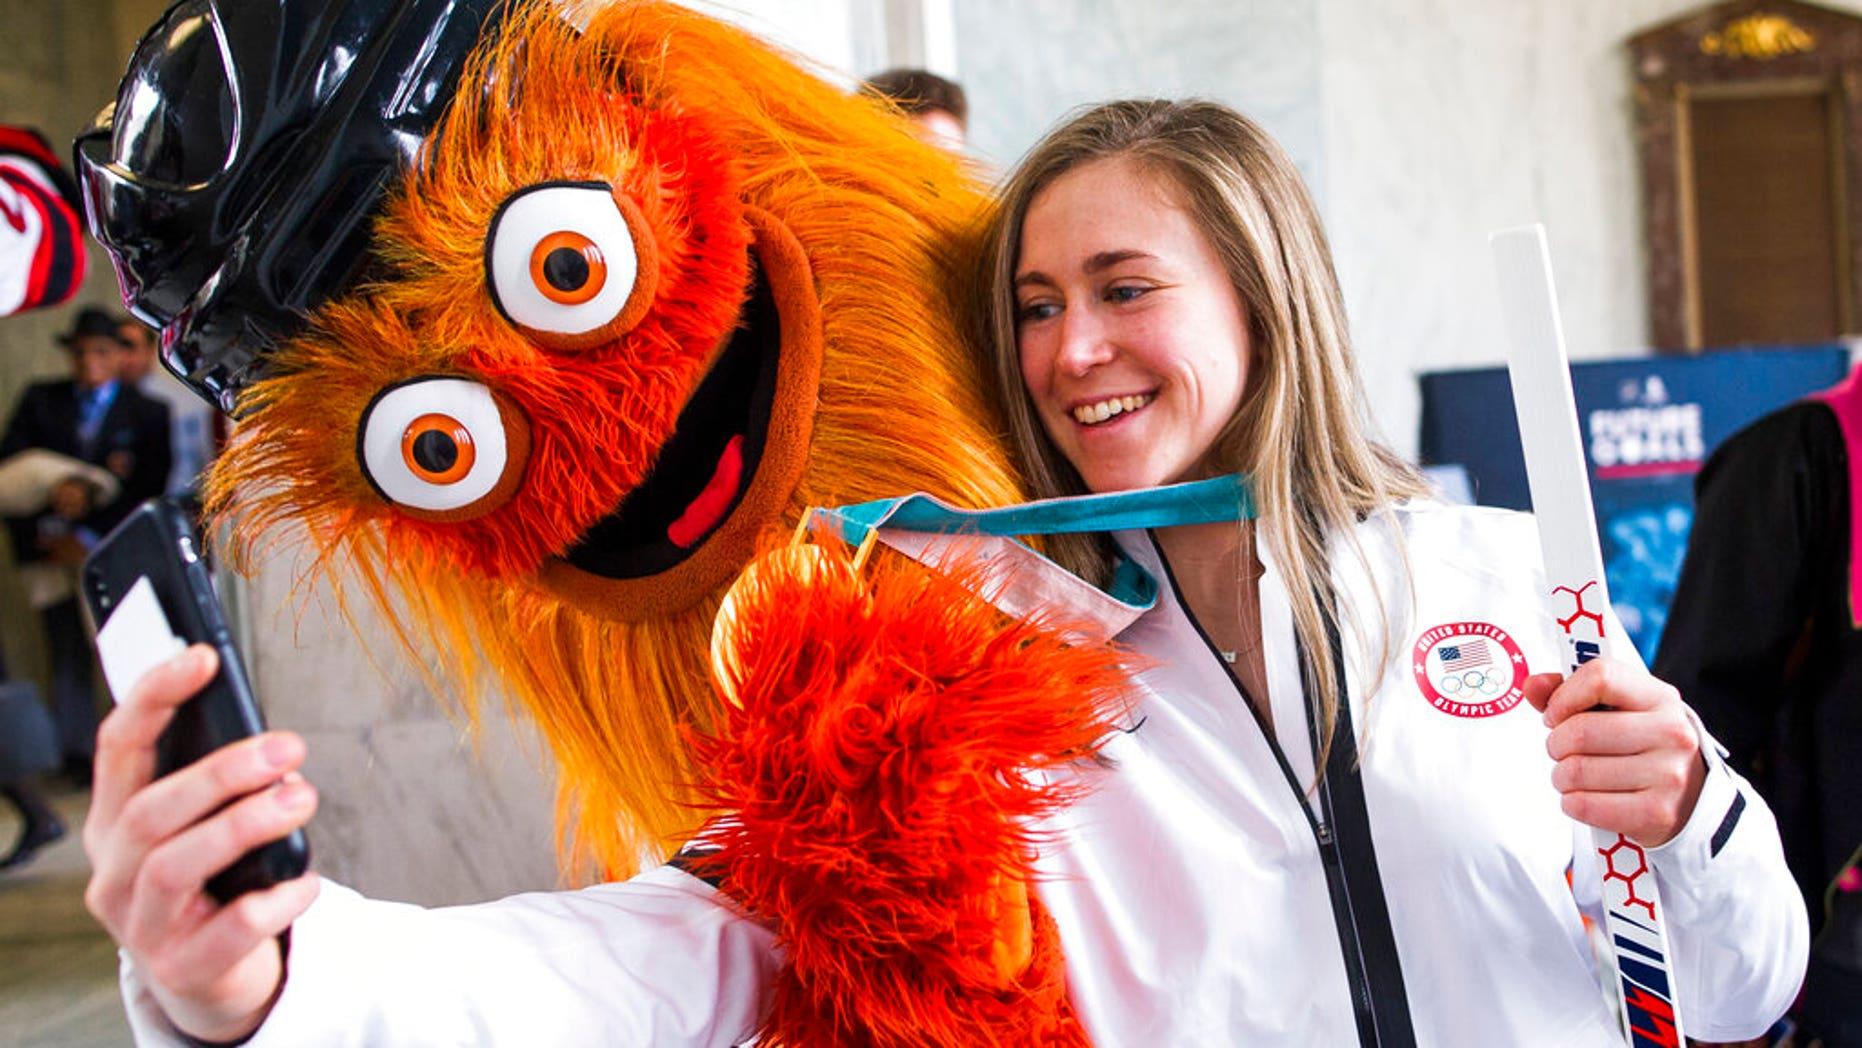 Olympic gold medalist hockey player Haley Skarupa talks a selfie with the NHL Philadelphia Flyers mascot Gritty.